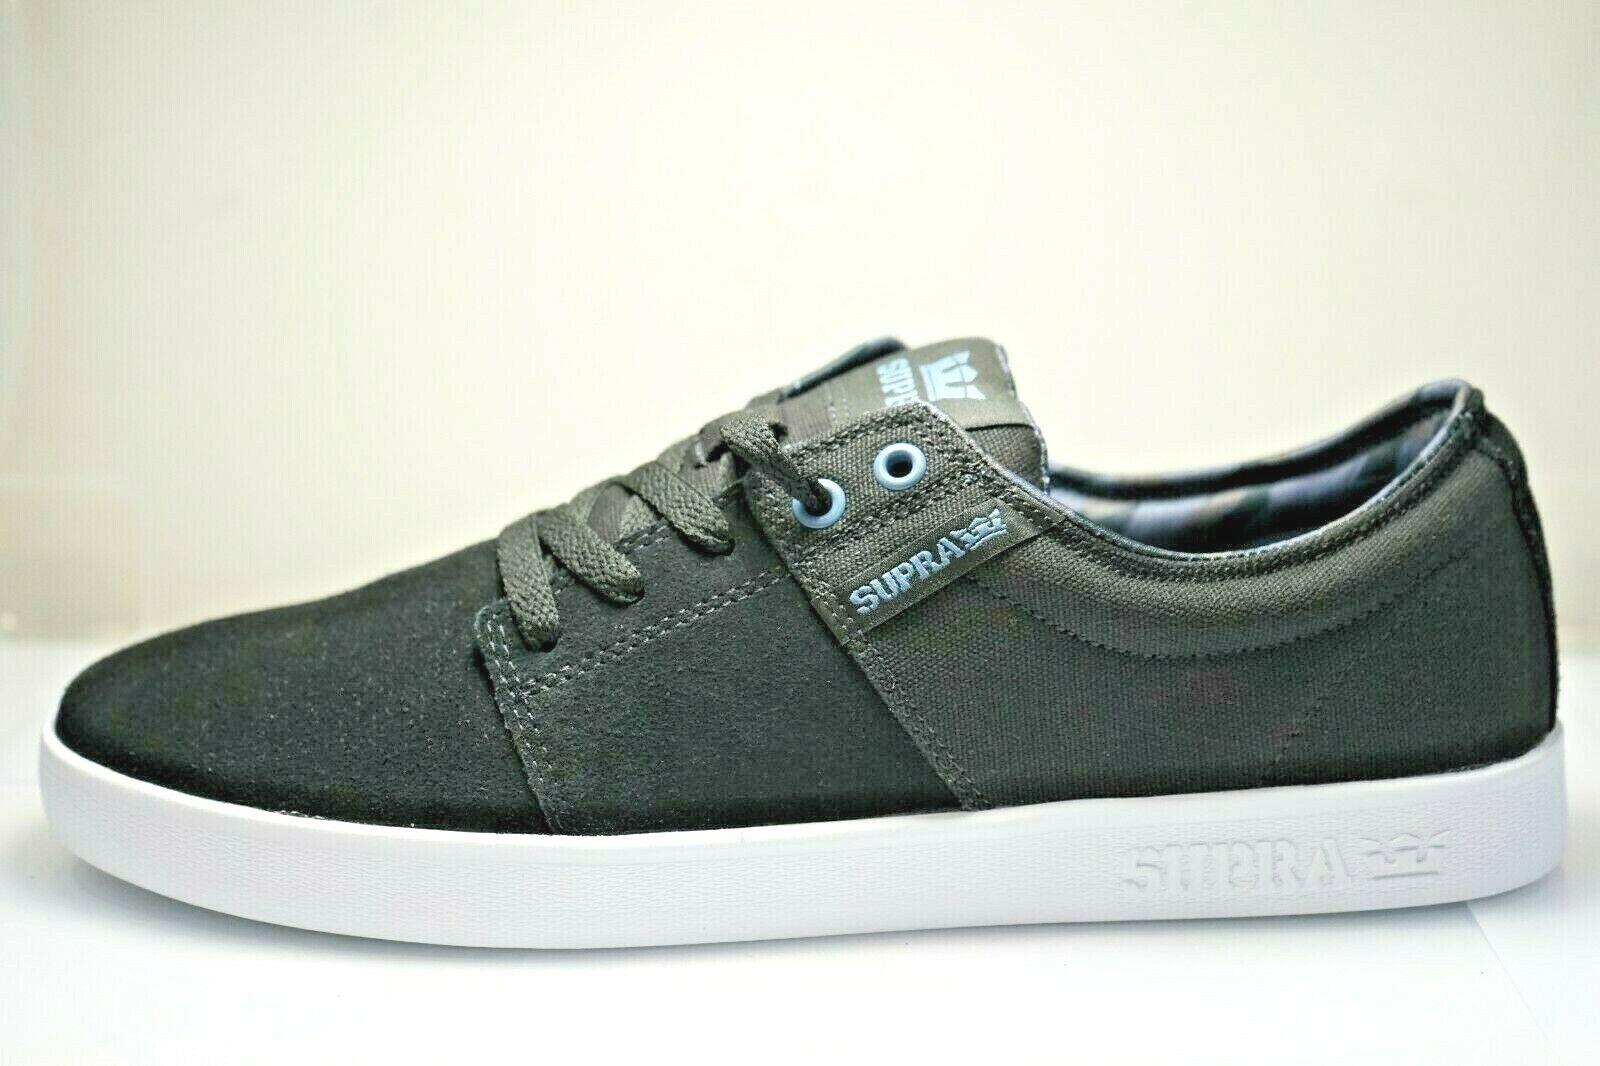 Supra Stacks II Mens Boys Skate Shoes Trainers Size UK 3 / EU 36 Suede (Y3J)